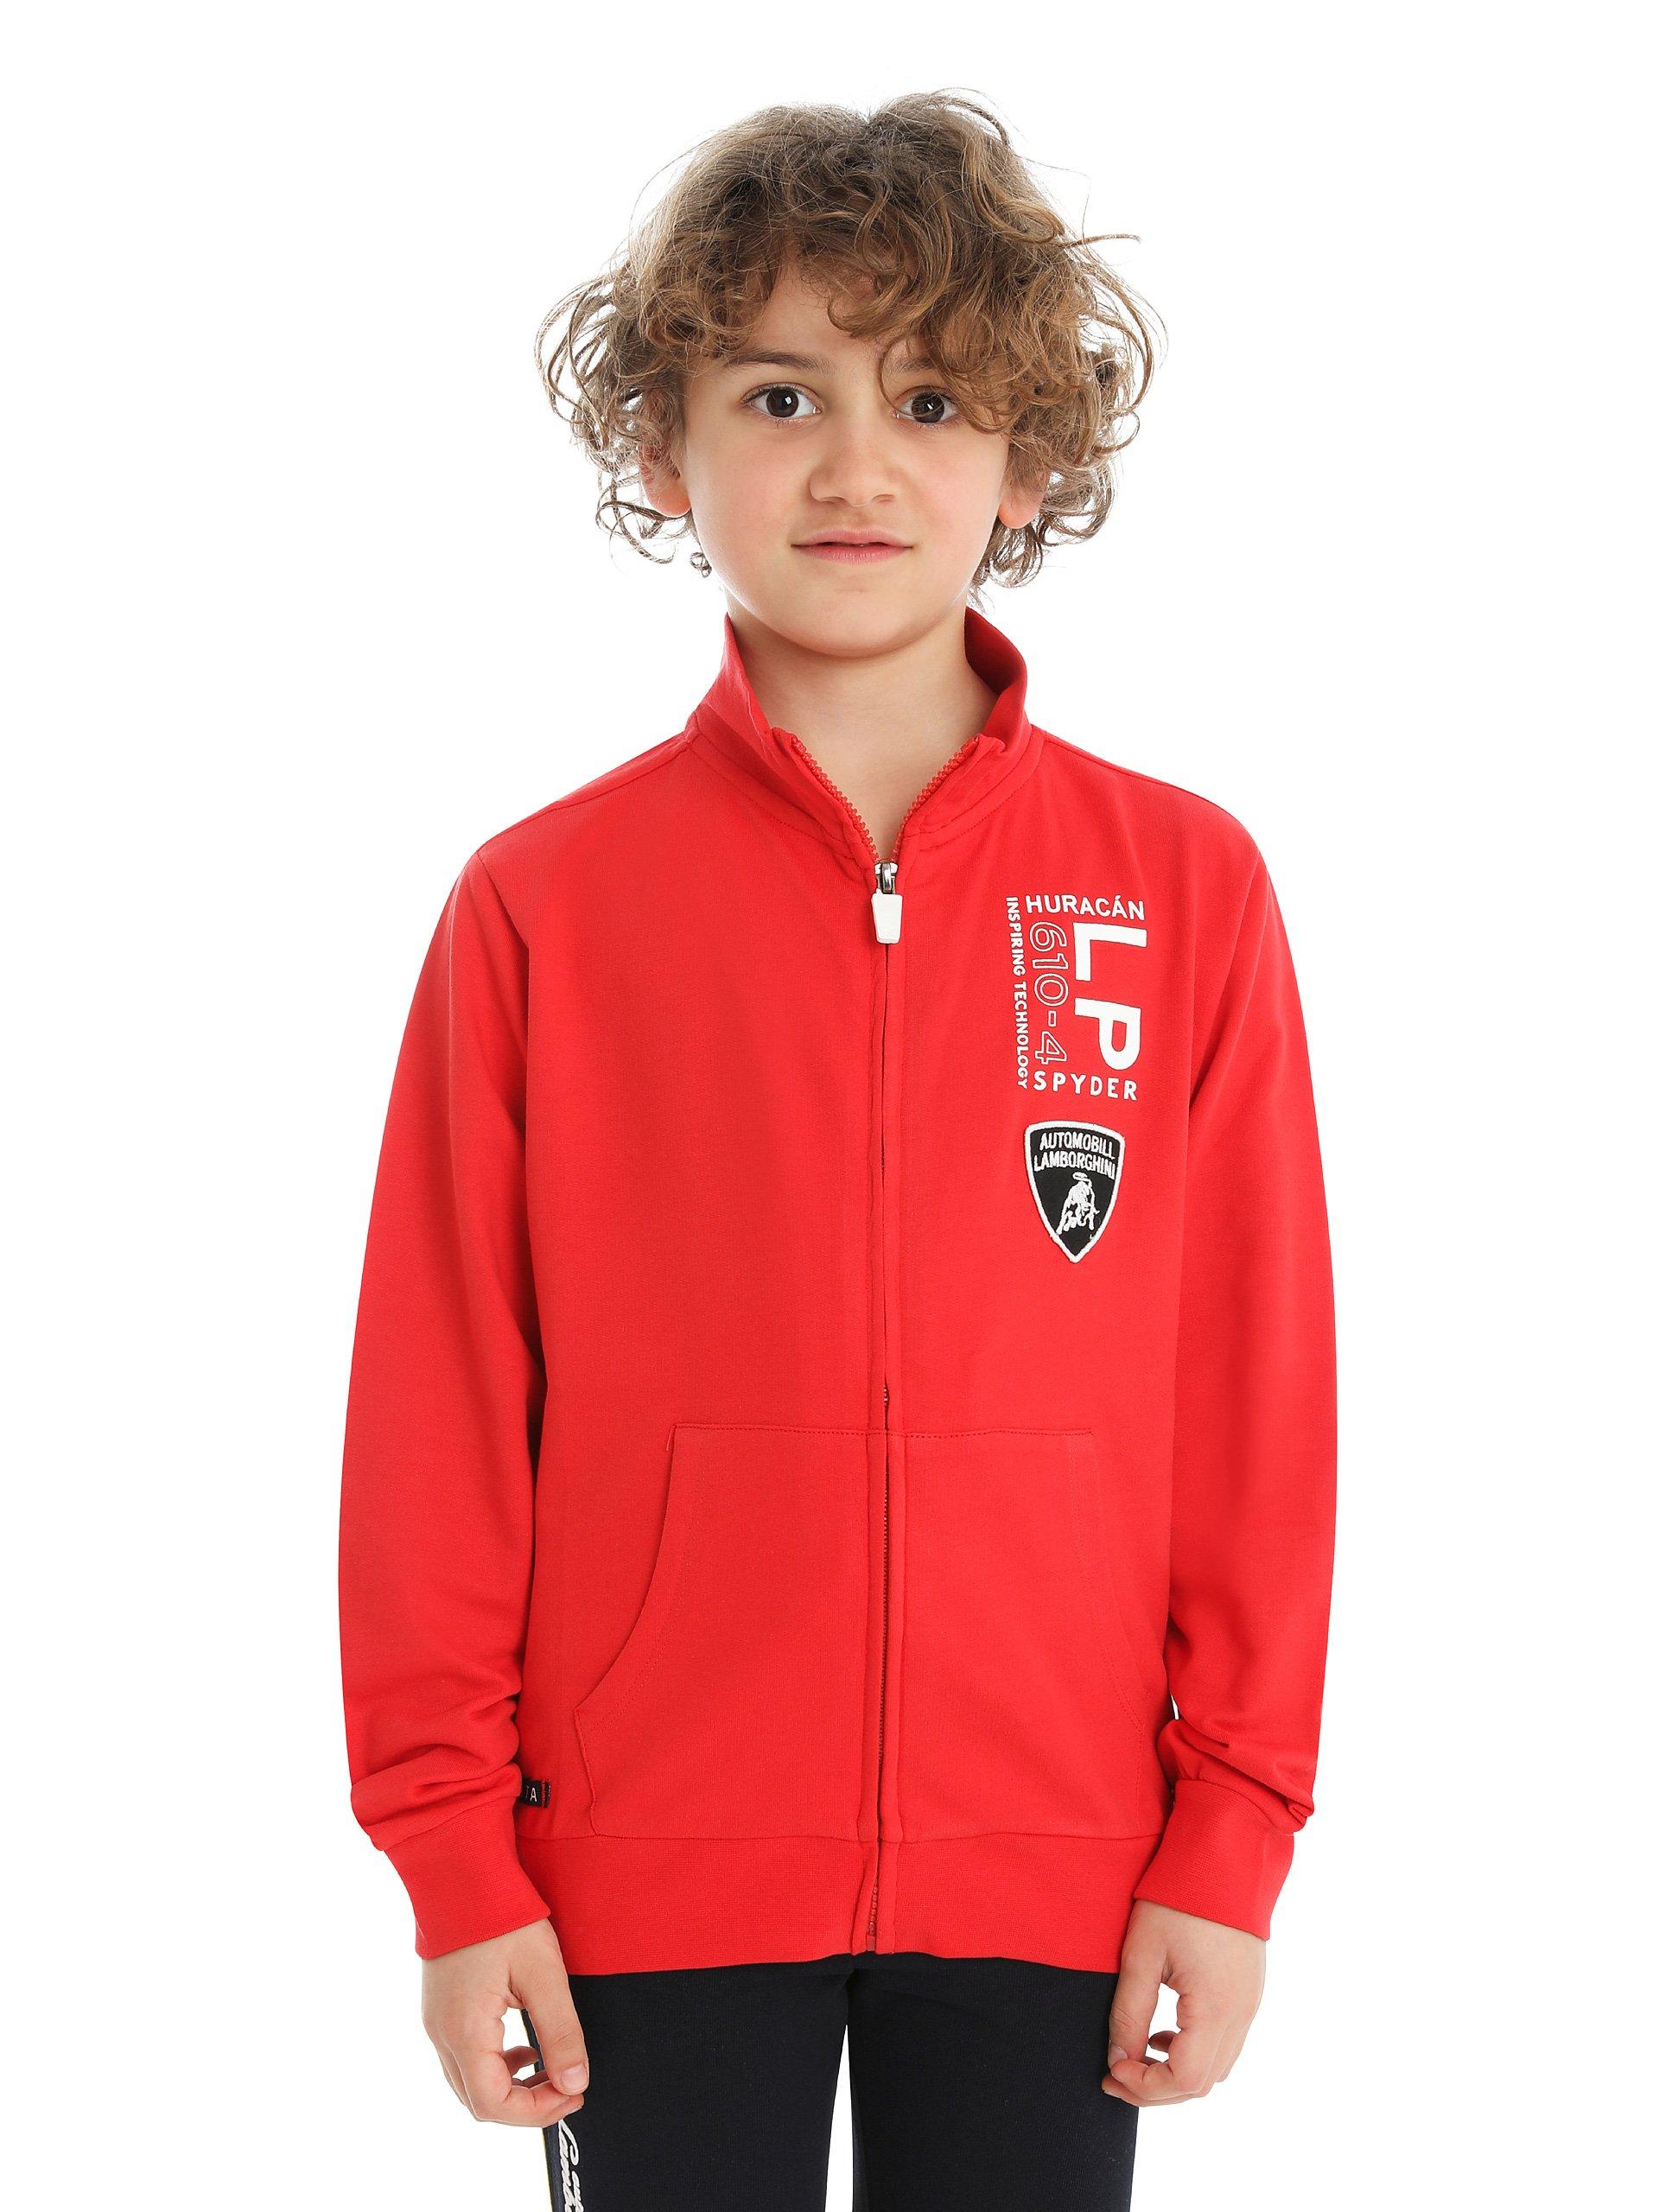 Automobili Lamborghini Children Kids Lamborghini Huracán Lp 610-4 Spyder Sweatshirt 6 Years Red